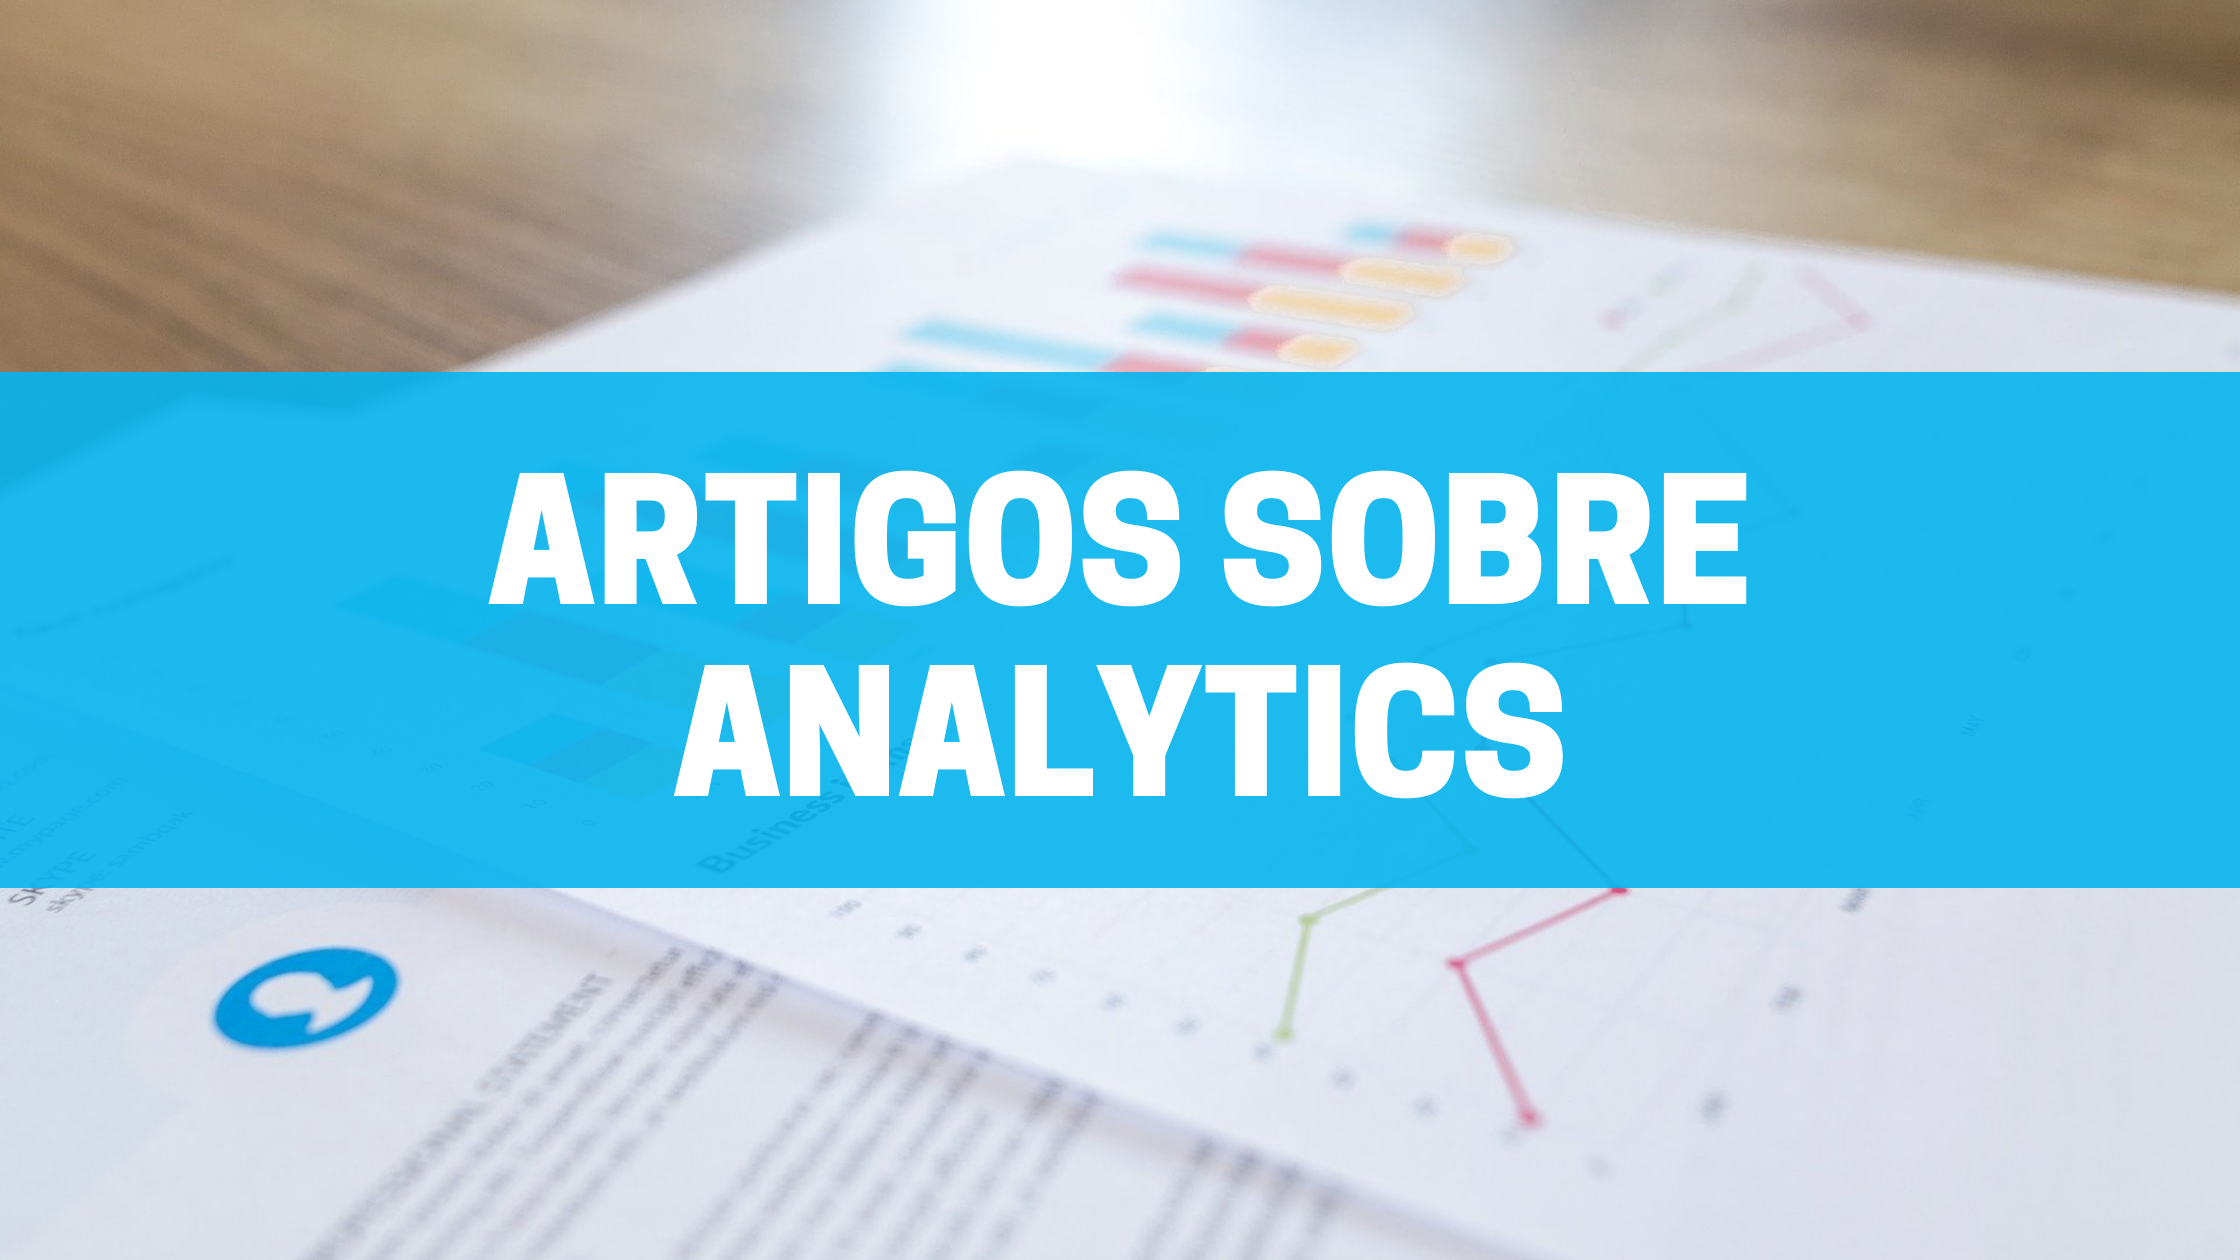 Artigos sobre web analytics